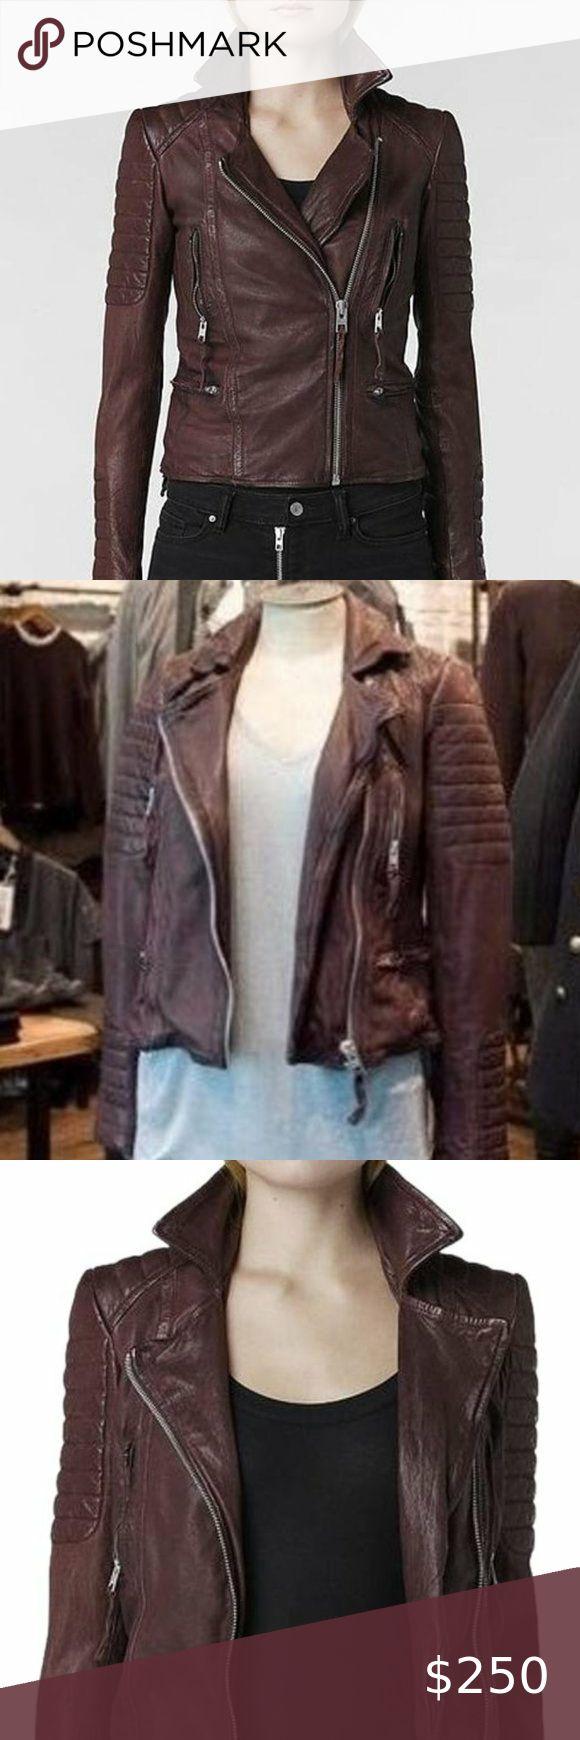 All Saints 'Alder Leather Jacket US 4 in 2020 Leather